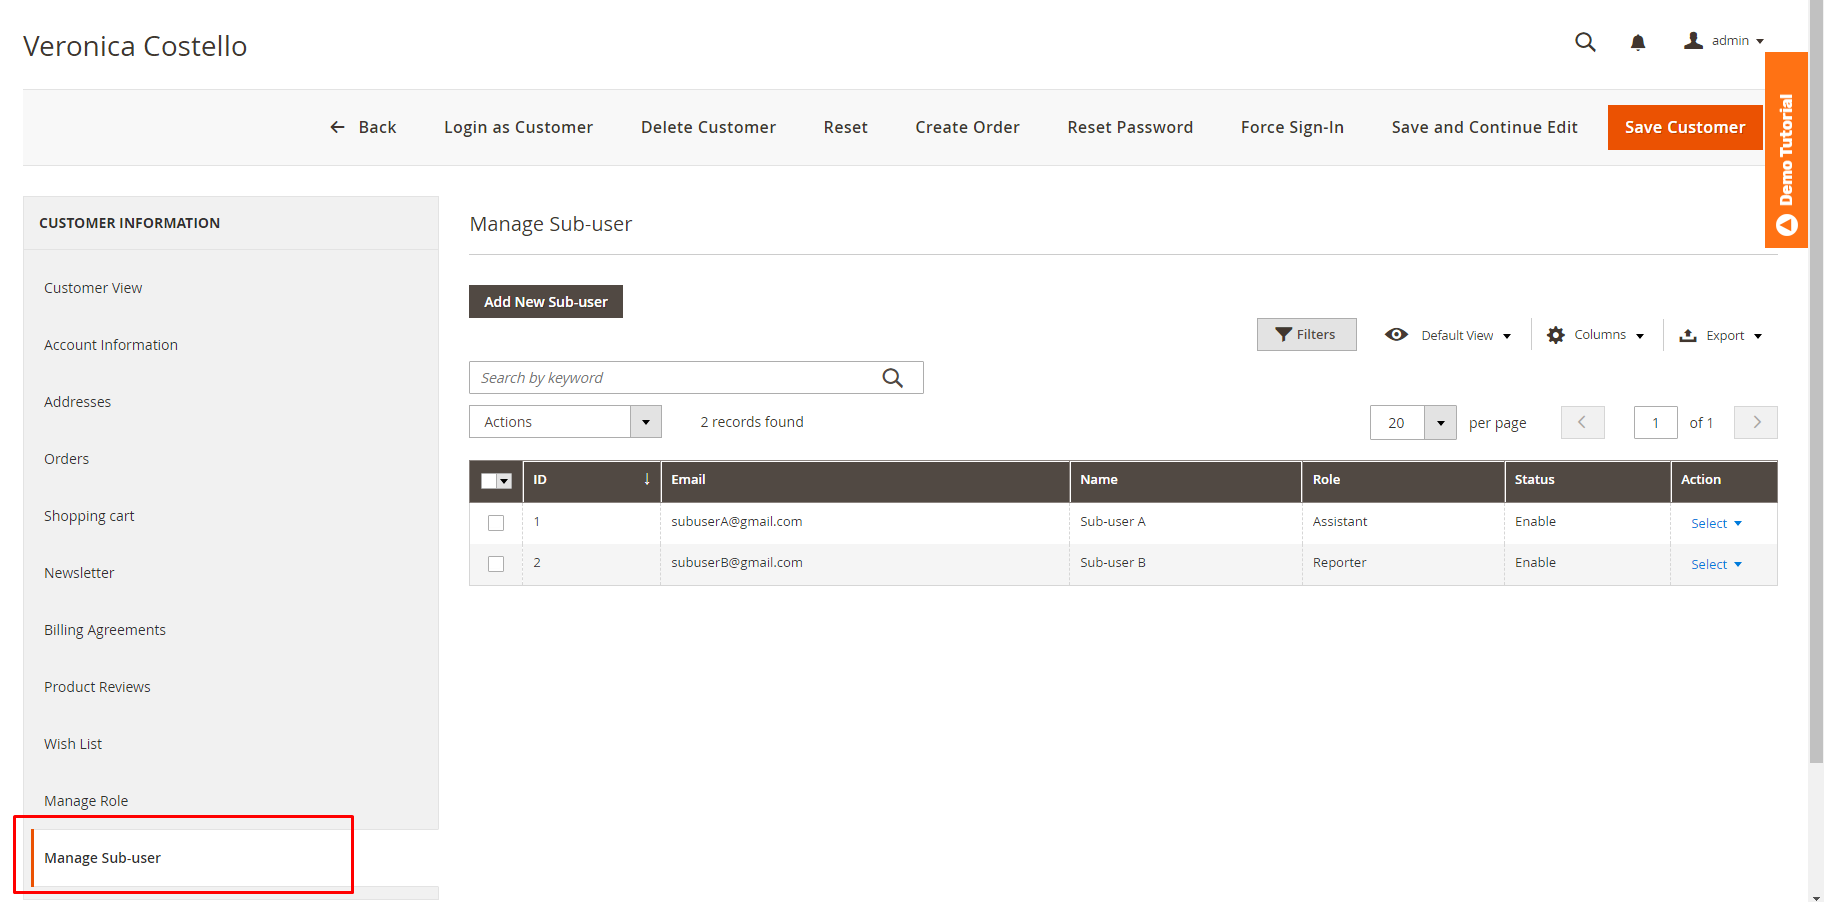 magento-2-company-account-addon-convert-existing-customers